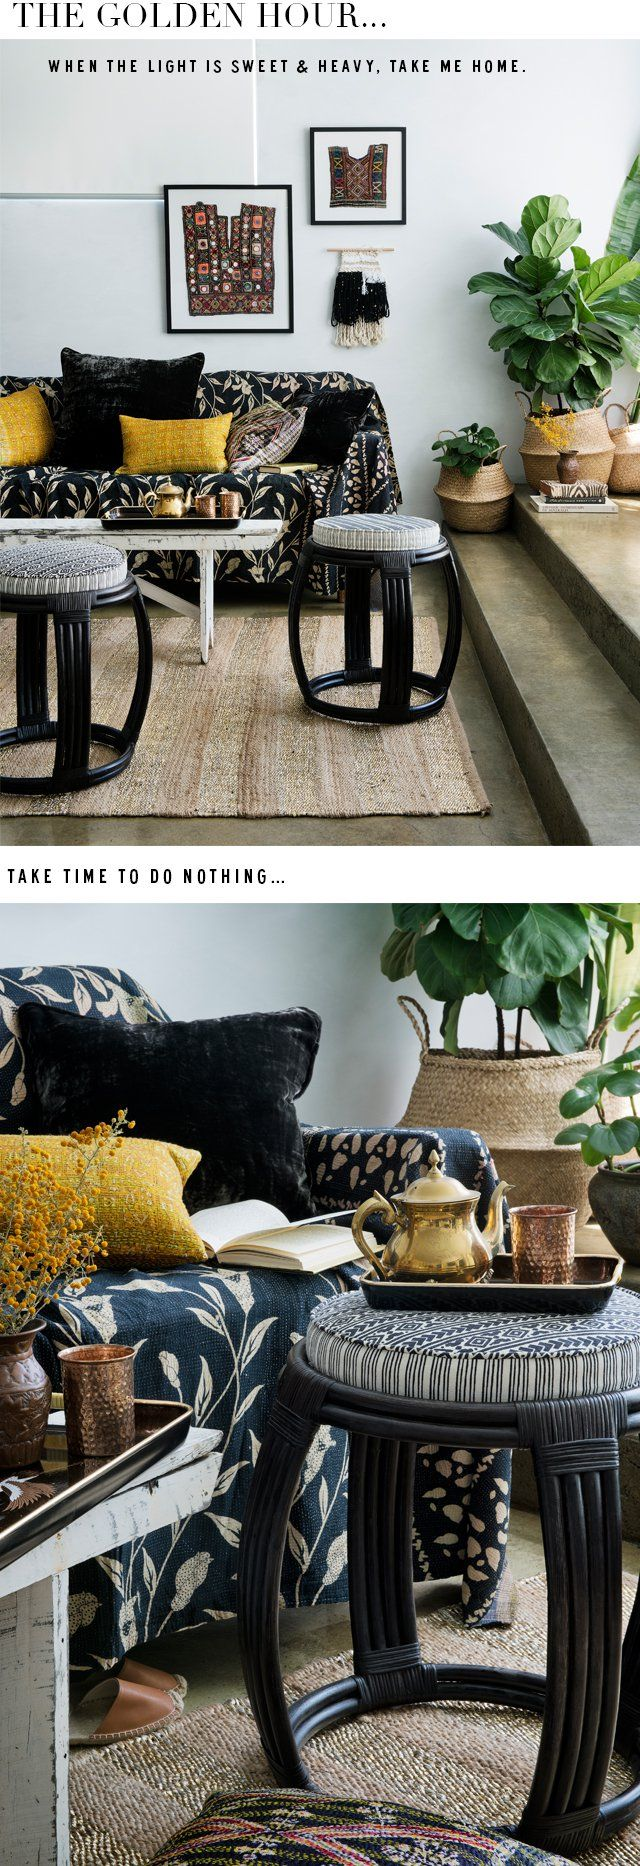 Blog | Bowerhouse